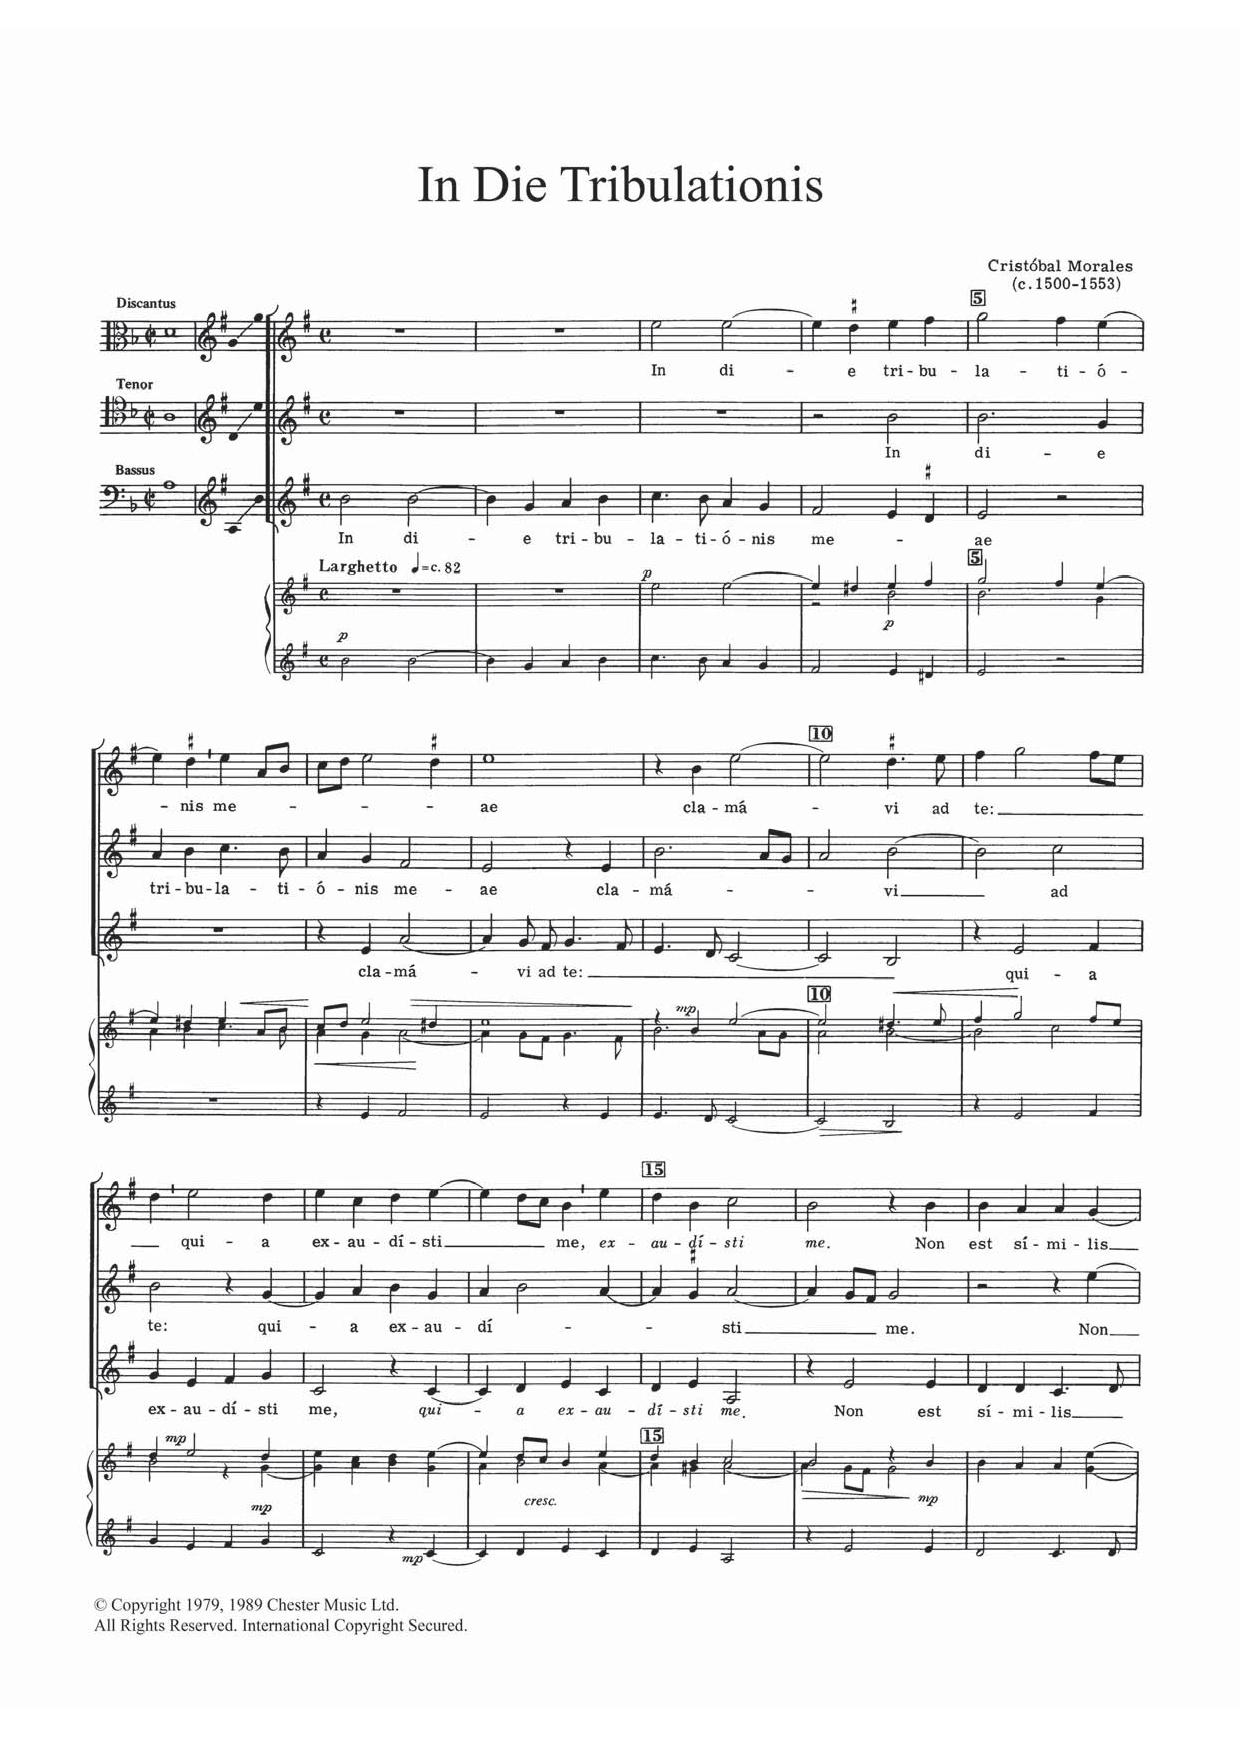 In Die Tribulationis Sheet Music